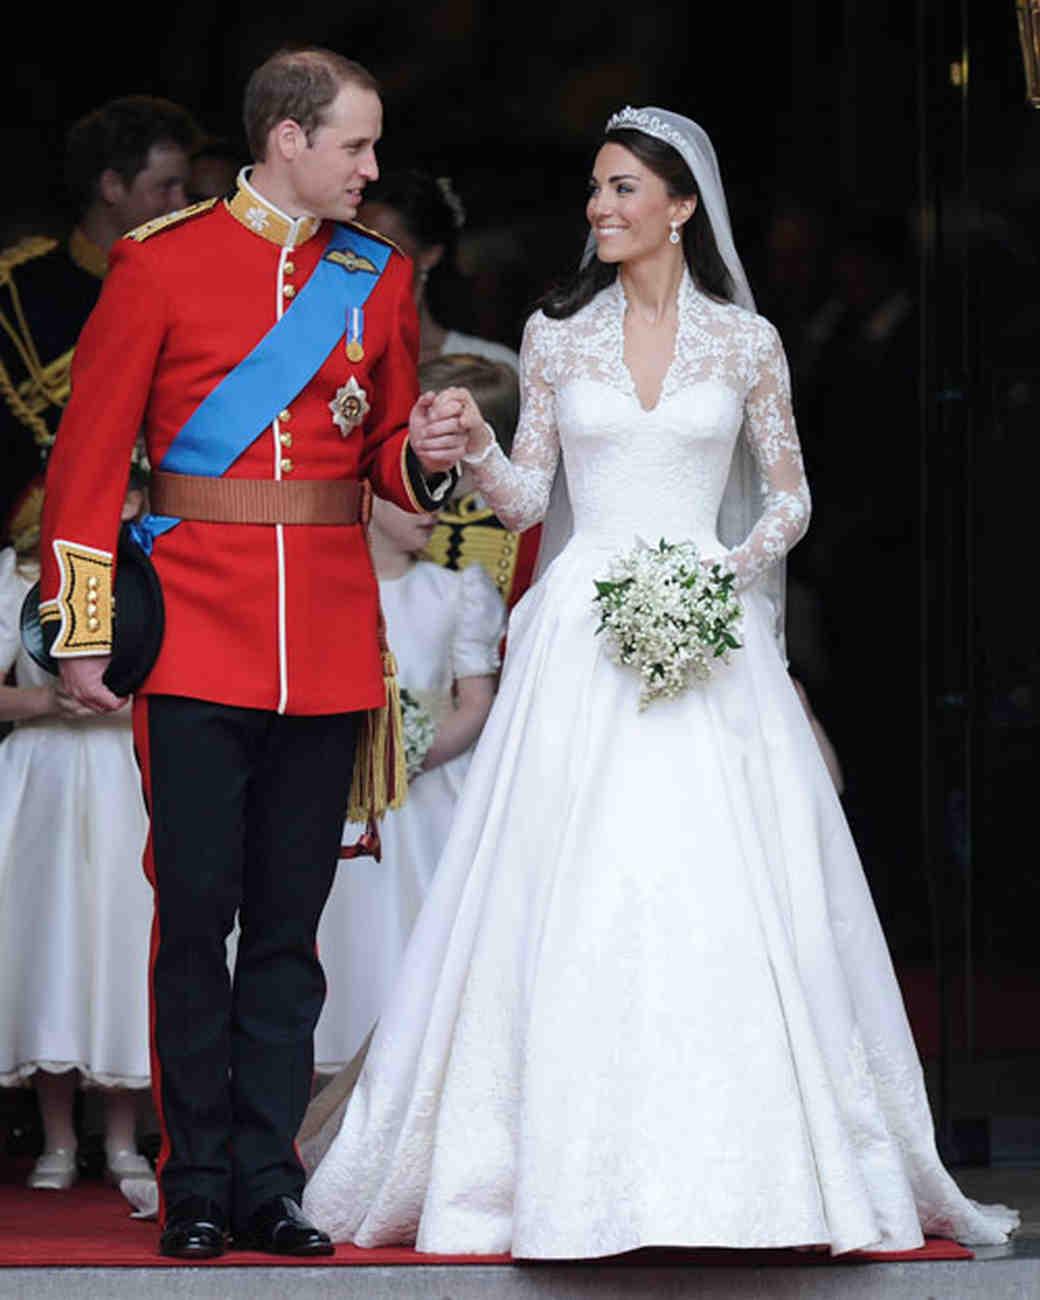 royal-wedding-ap110429134361_hd.jpg